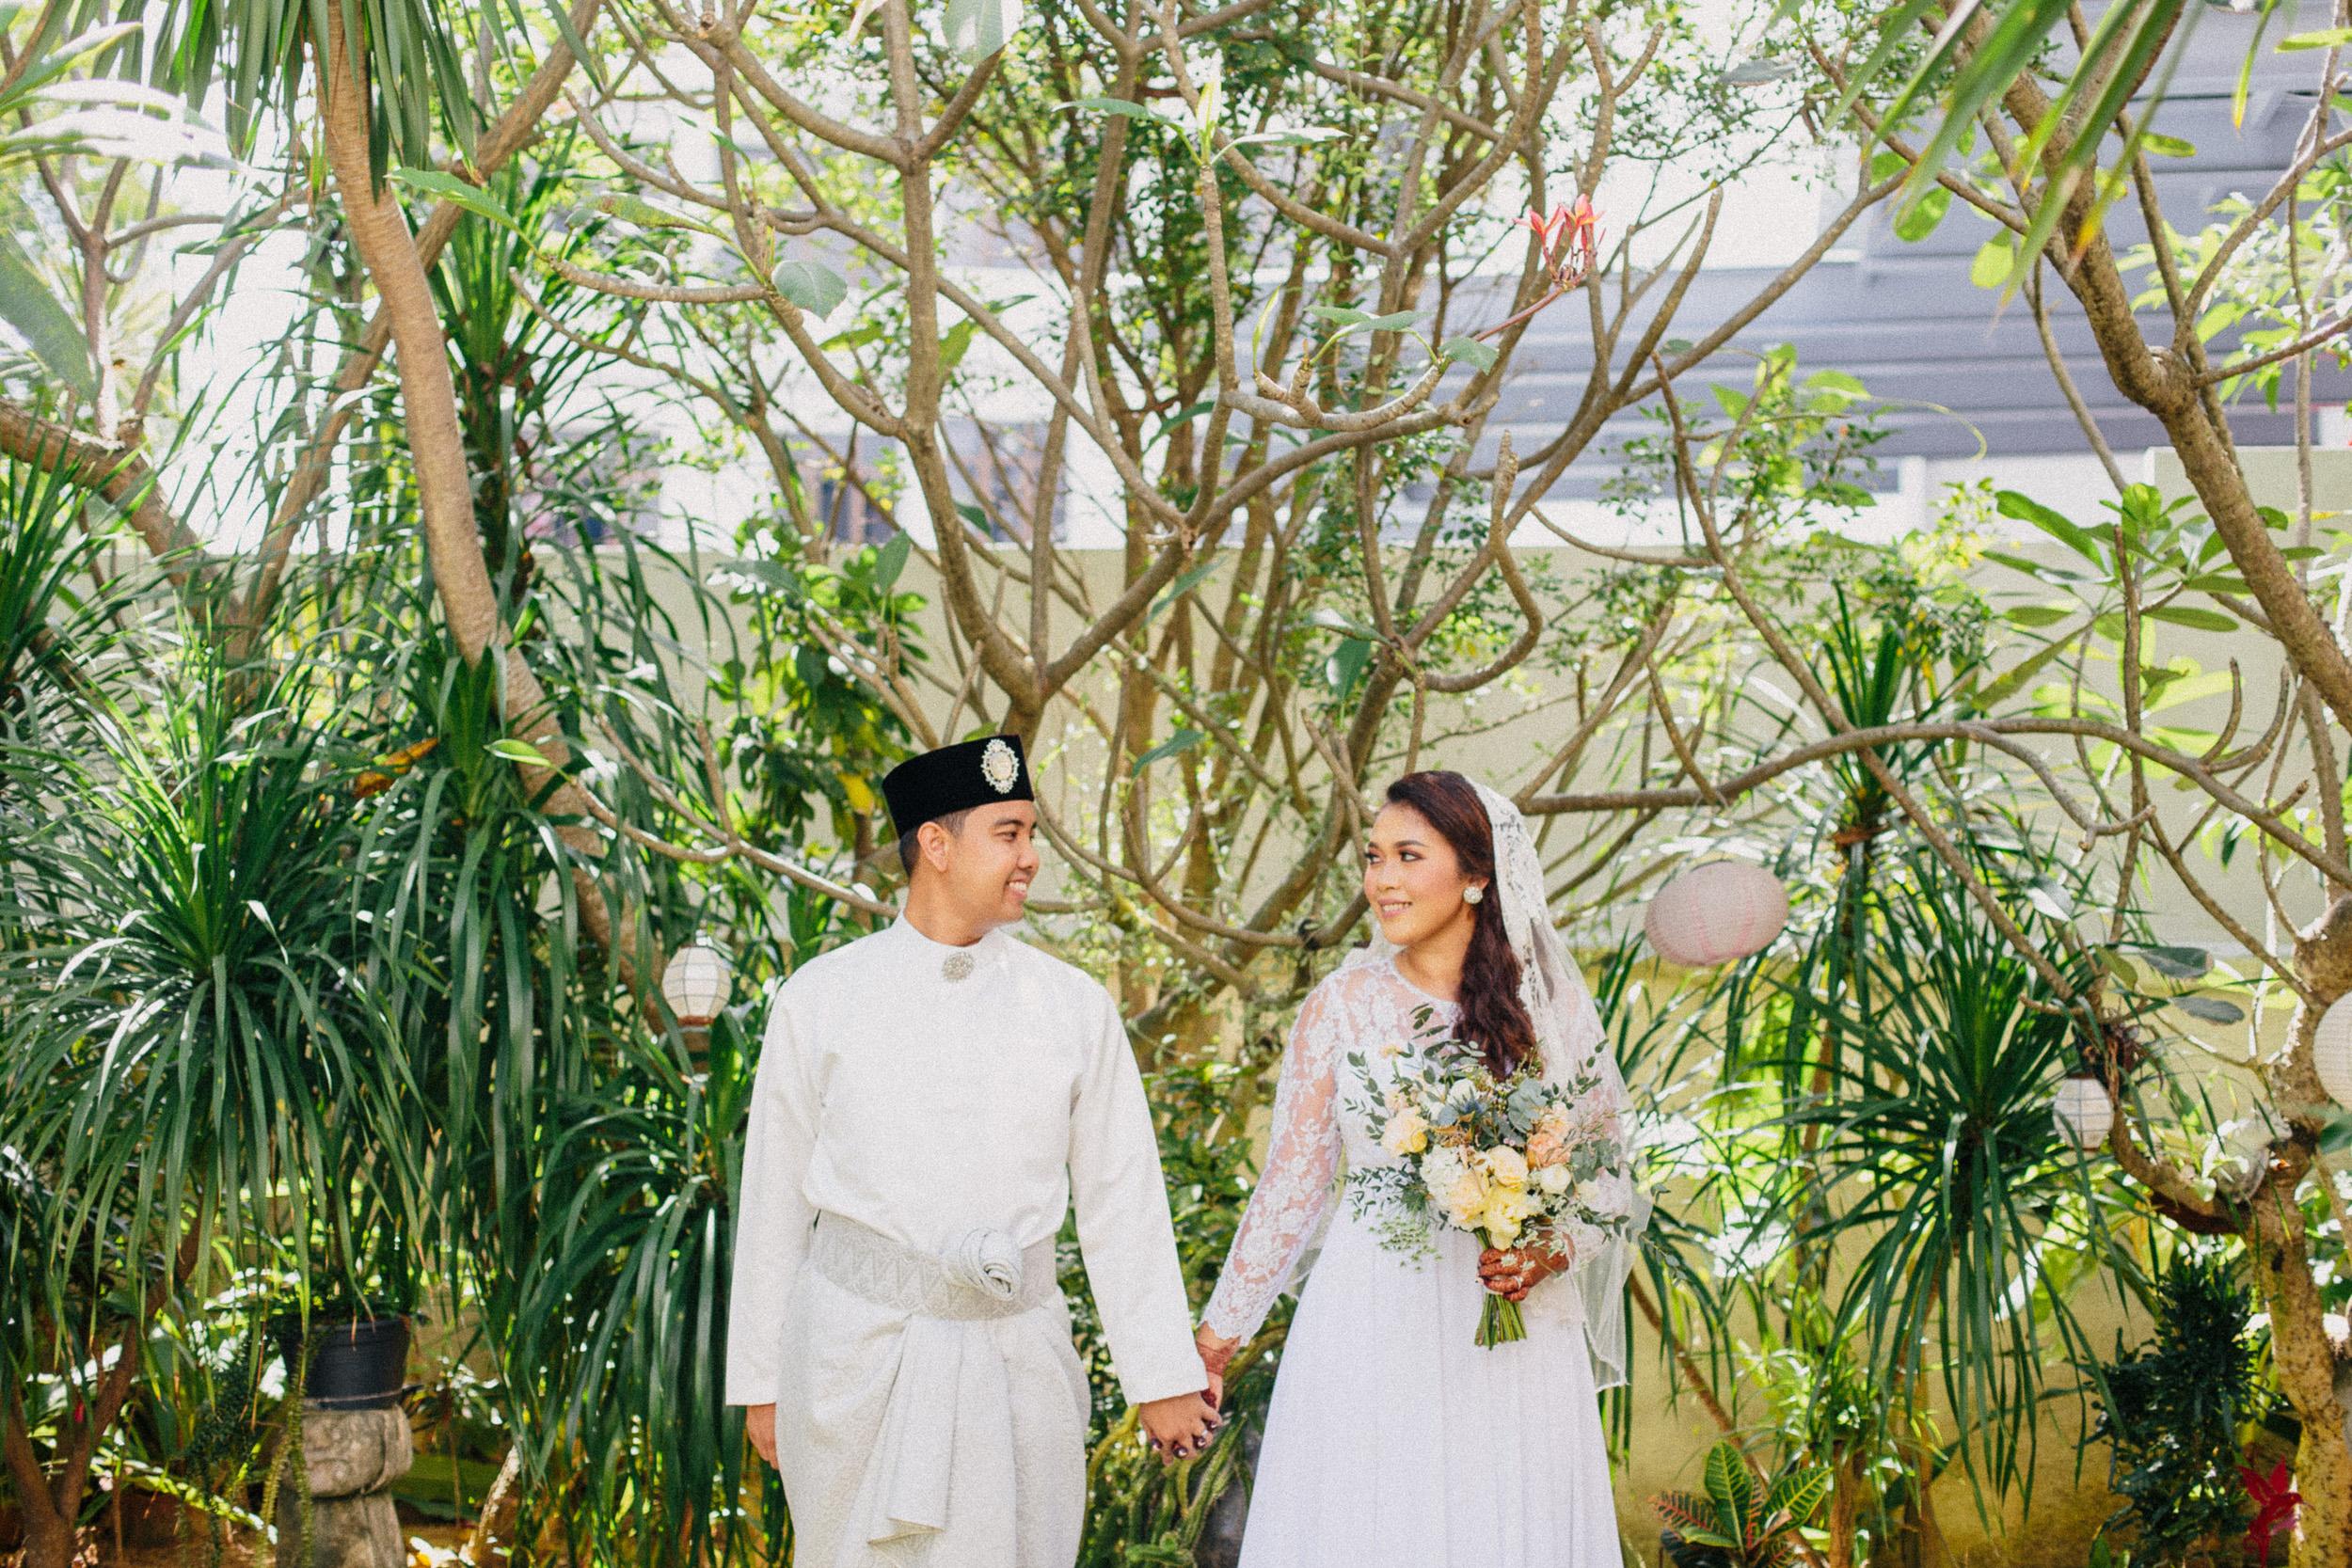 singapore-wedding-photographer-photography-wmt2017-010.jpg